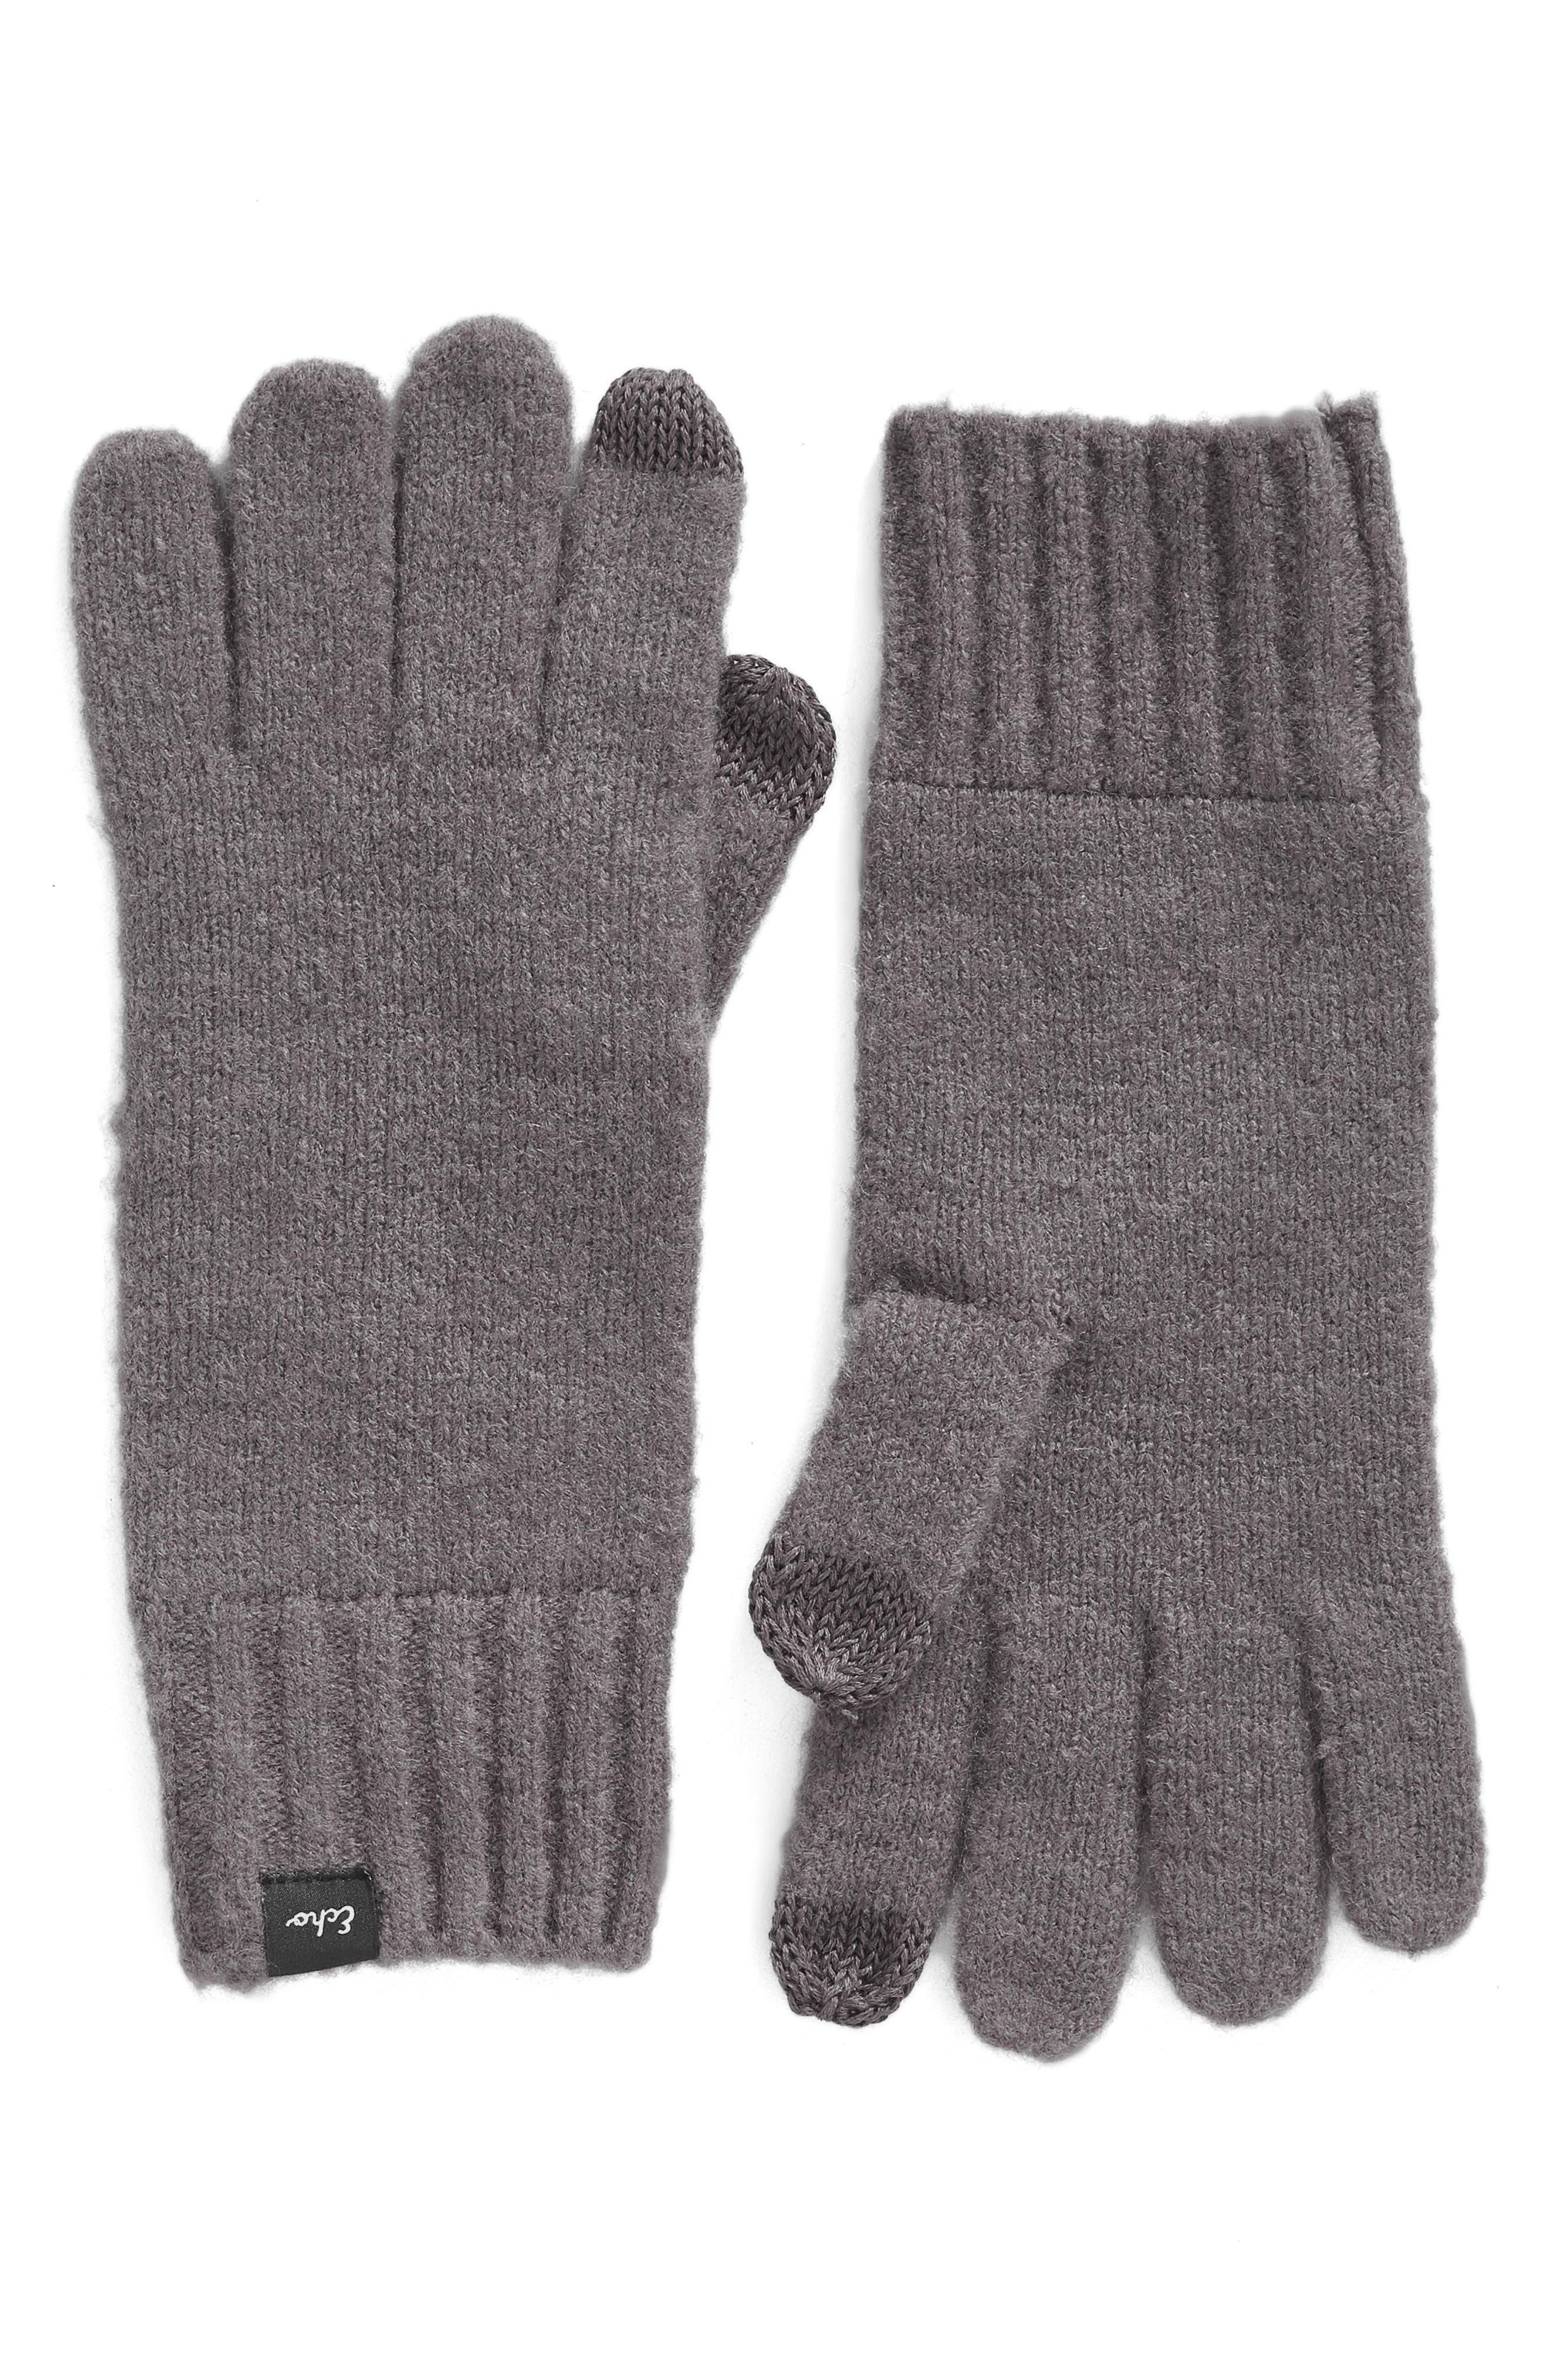 'Touch' Stretch Fleece Tech Gloves,                         Main,                         color, Gunmetal